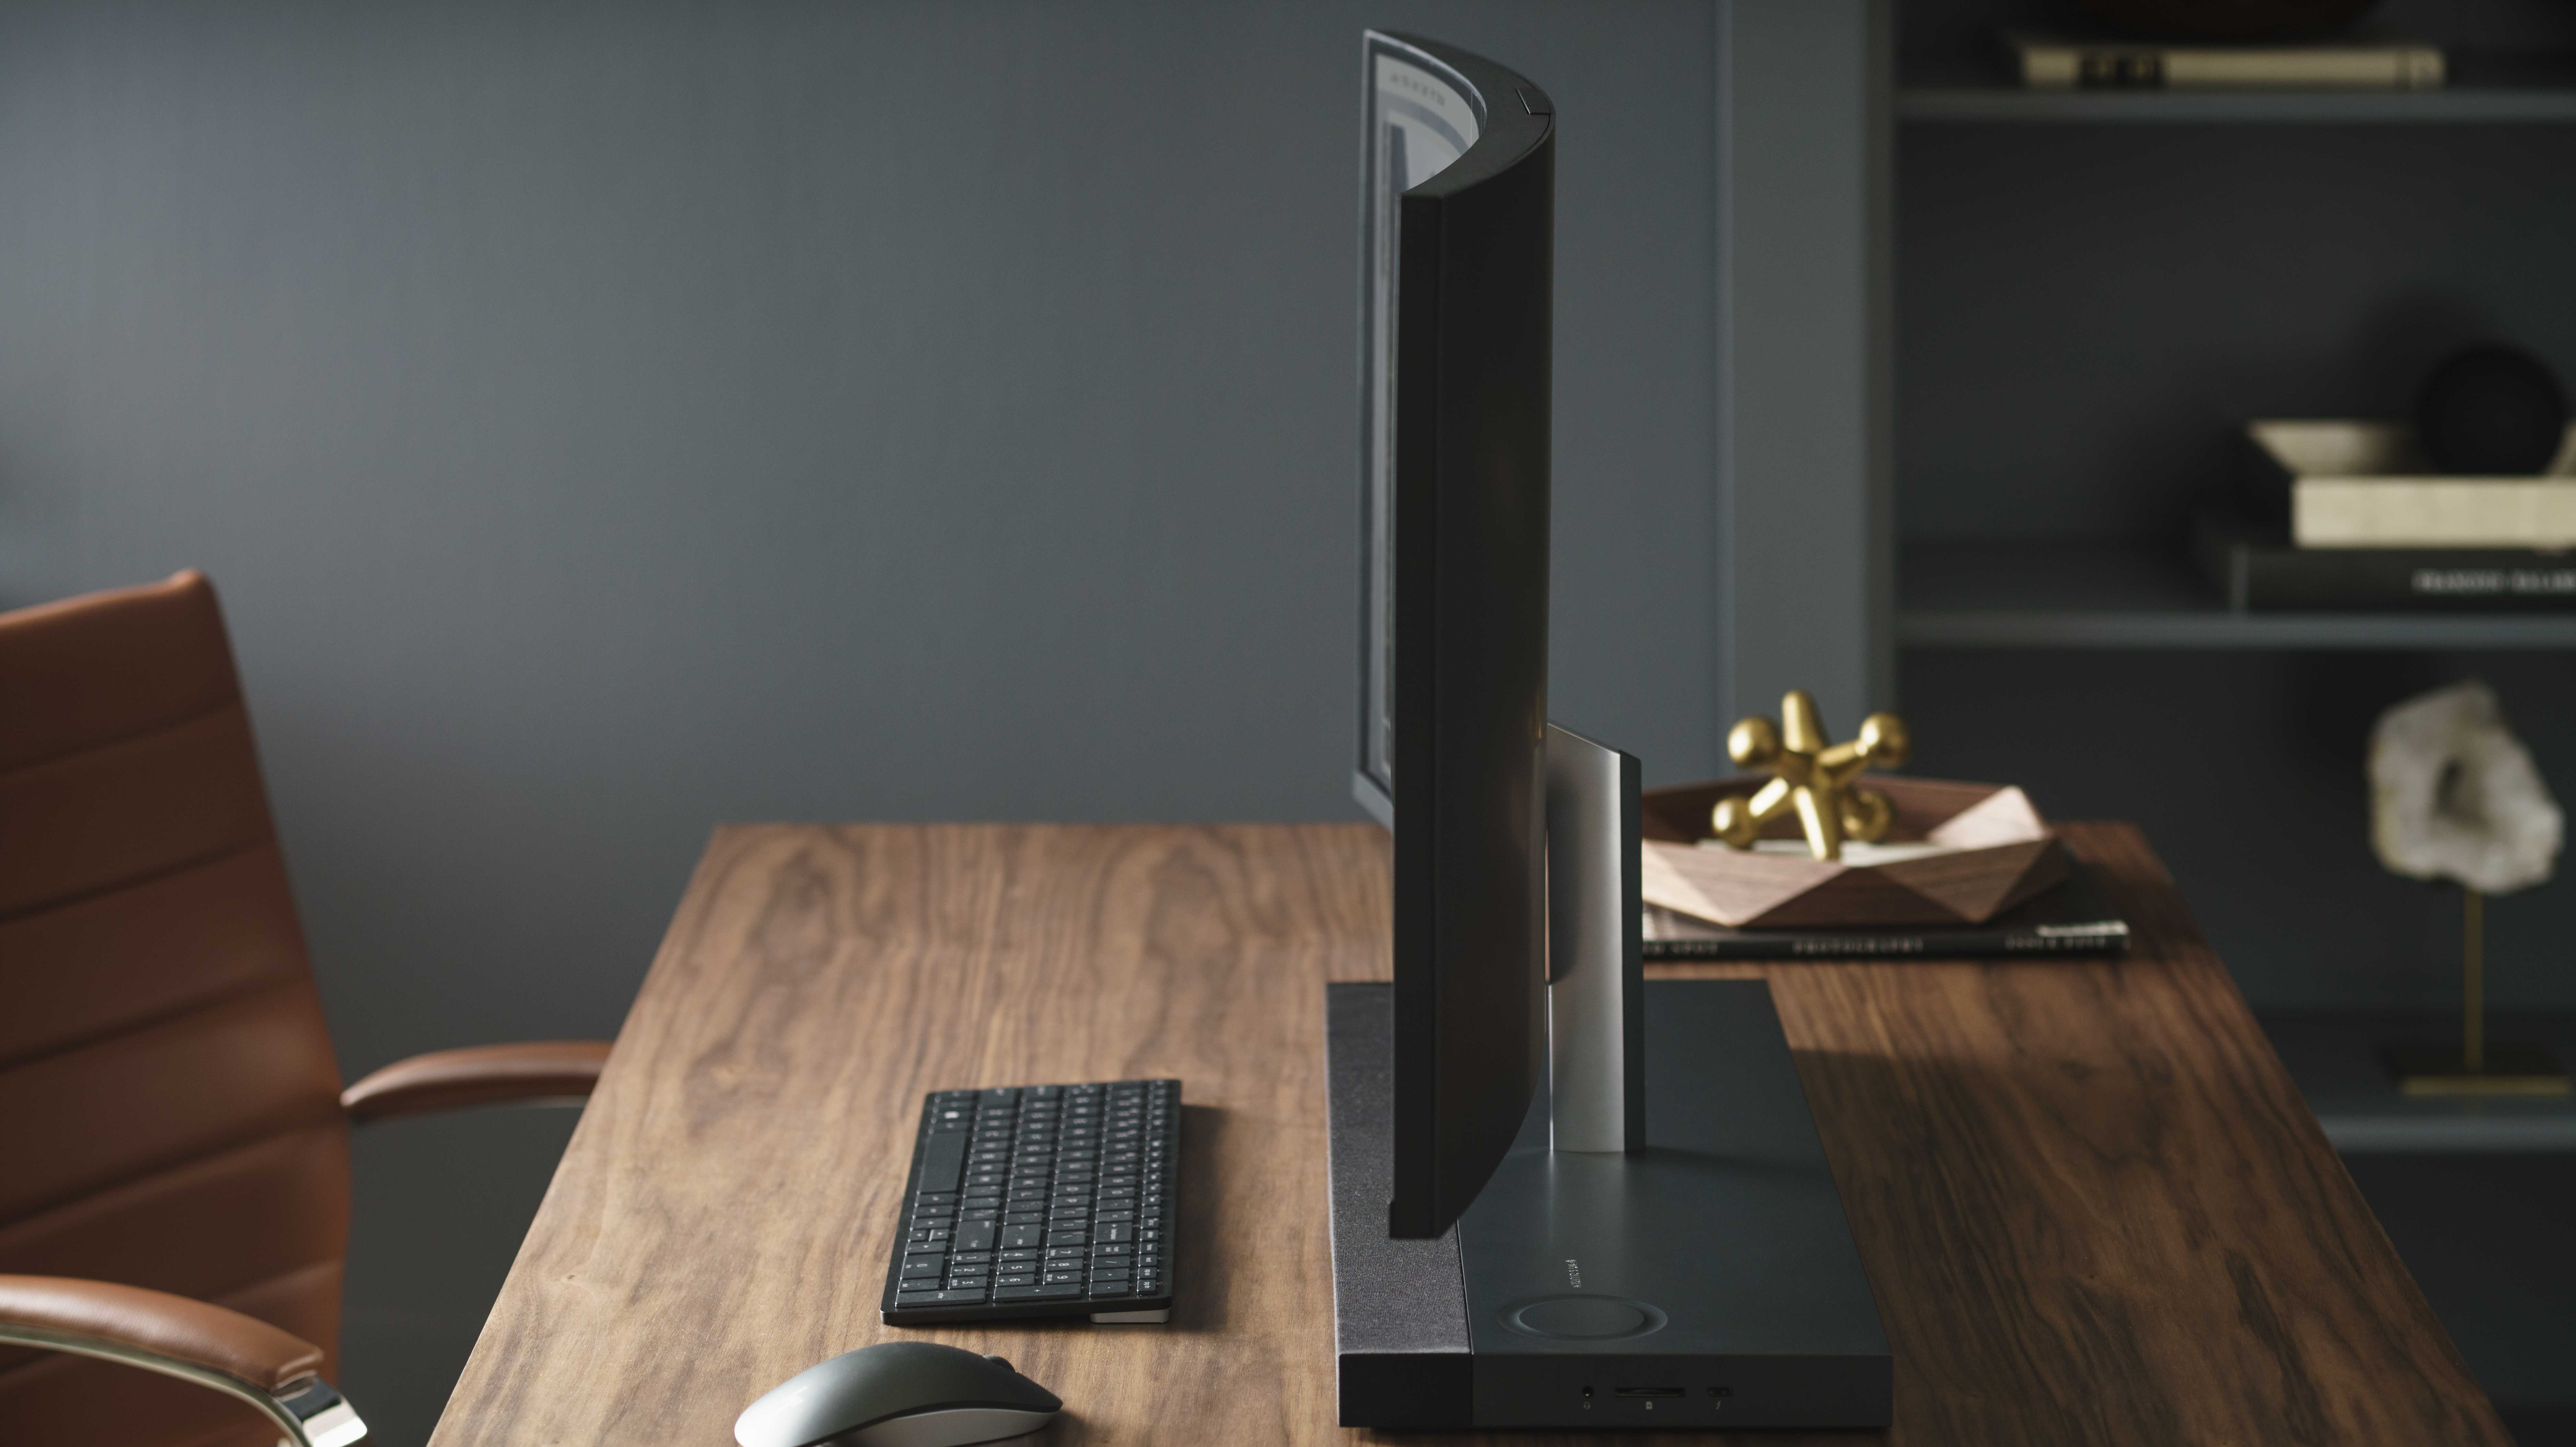 HP Envy Curved AiO 34: Edler All-in-One-PC mit gebogenem Riesendisplay